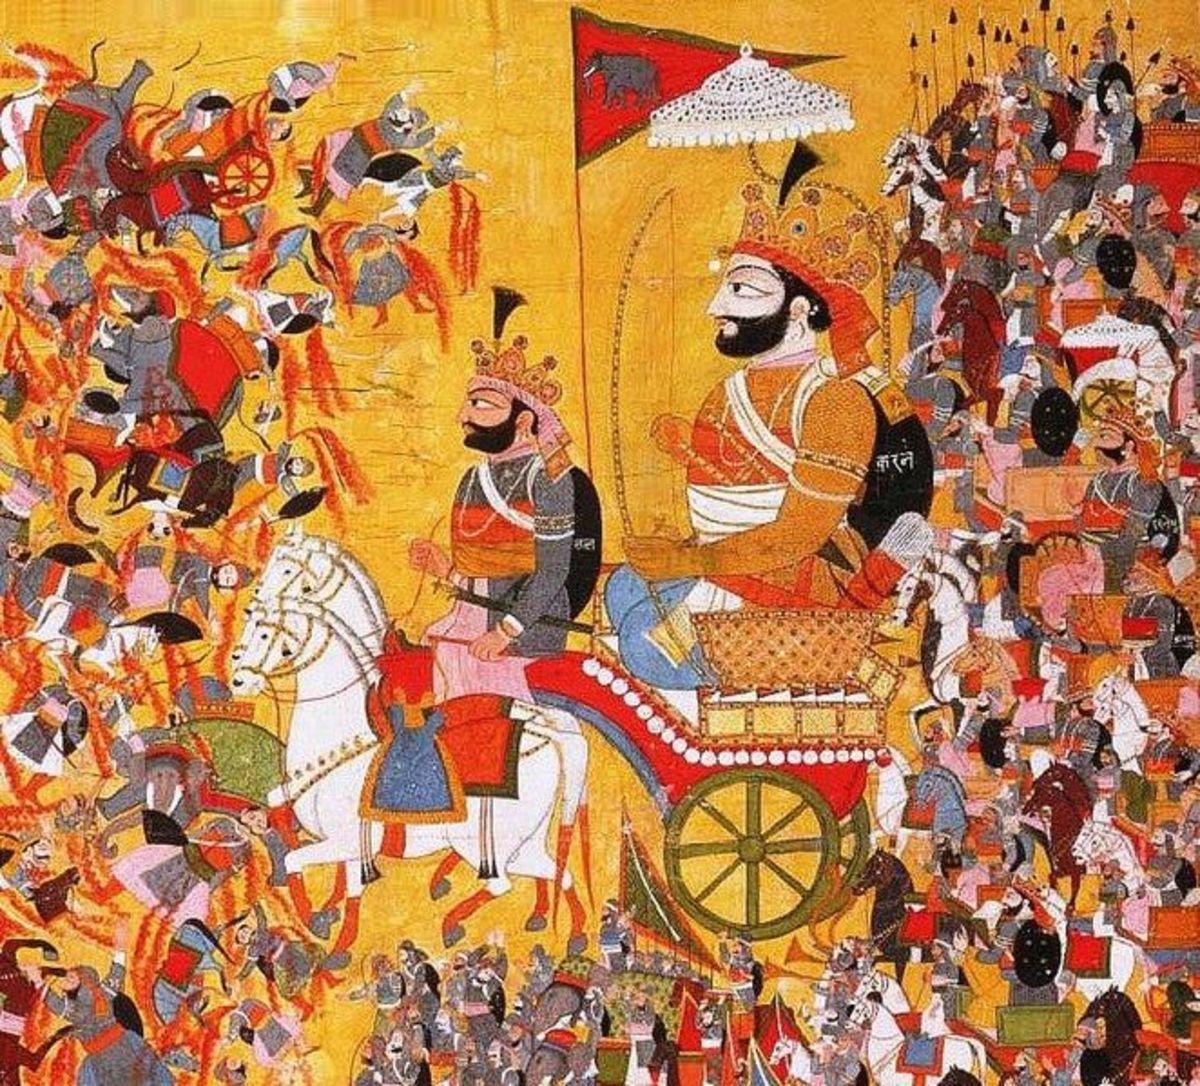 La pintura representa la batalla de Kurukshetra de la epopeya Mahabharata.  Karna, comandante del ejército Kaurava se ve aquí.